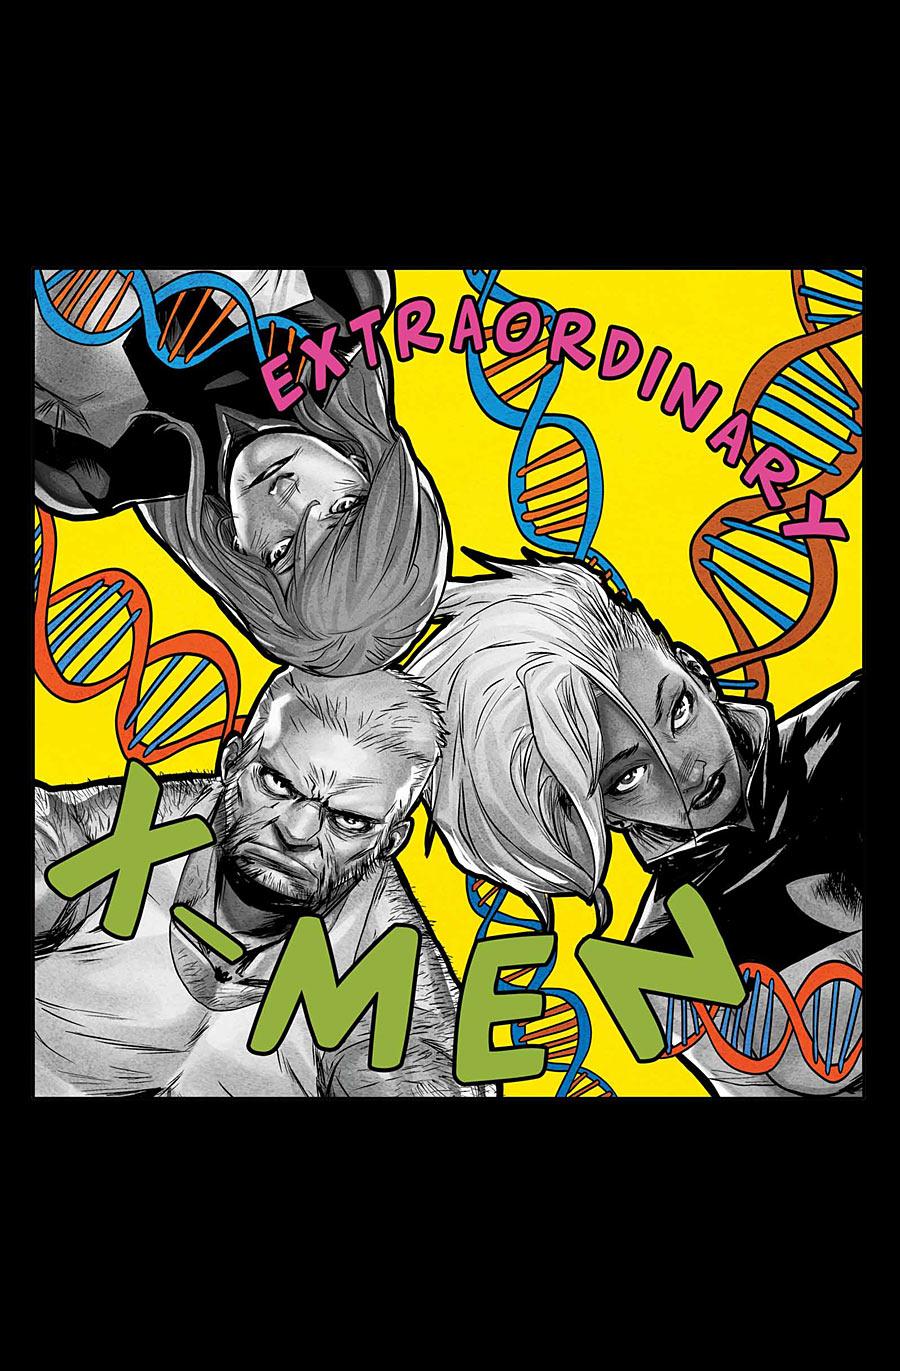 ExtraordinaryXmen-HIP-HOP-c04d4